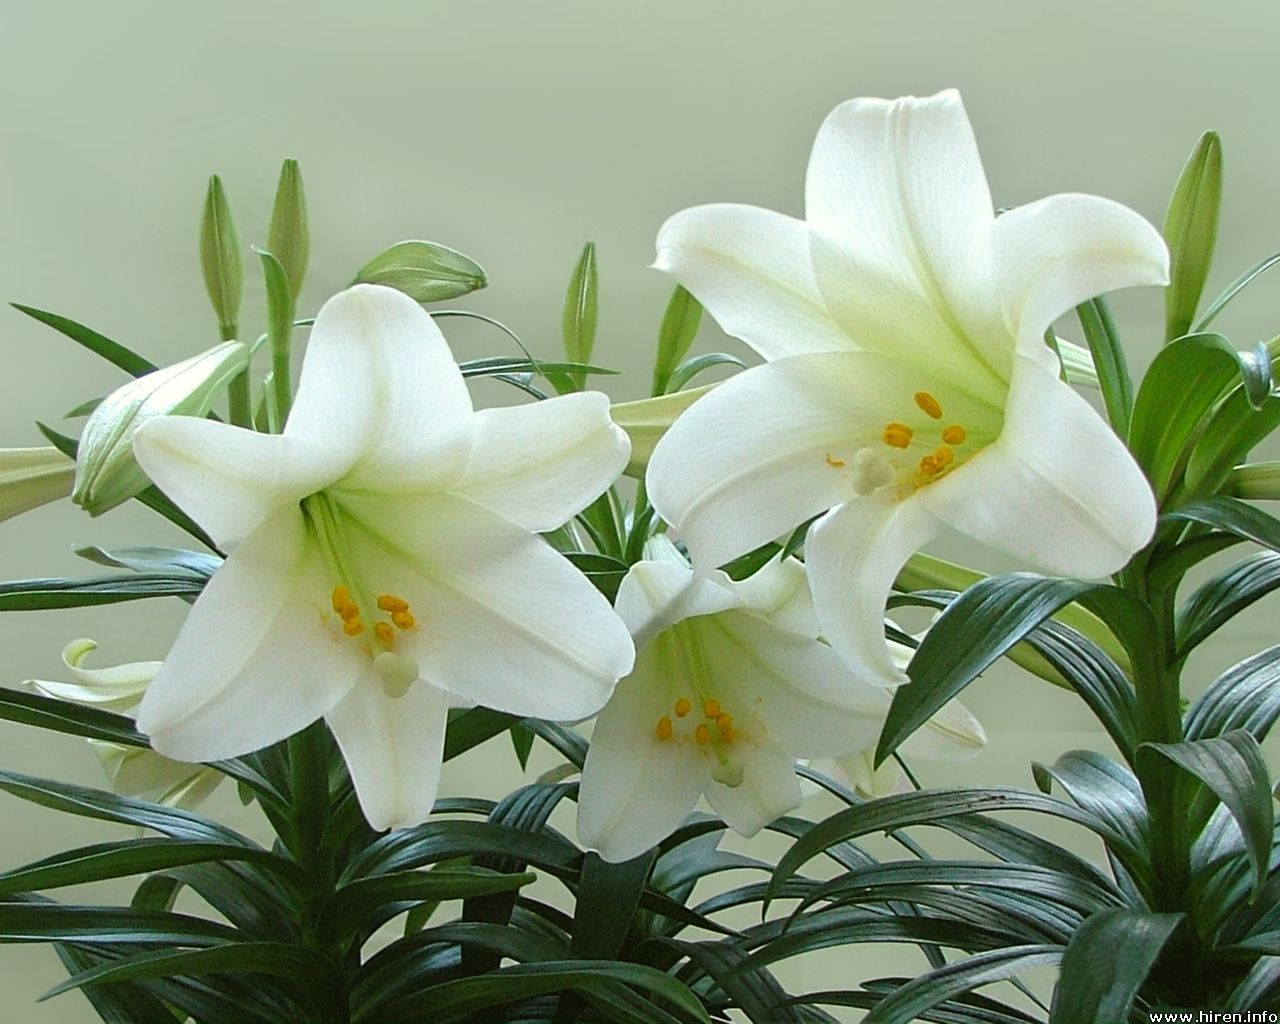 Health and medicinal benefits of white lily flower yabibo izmirmasajfo Gallery